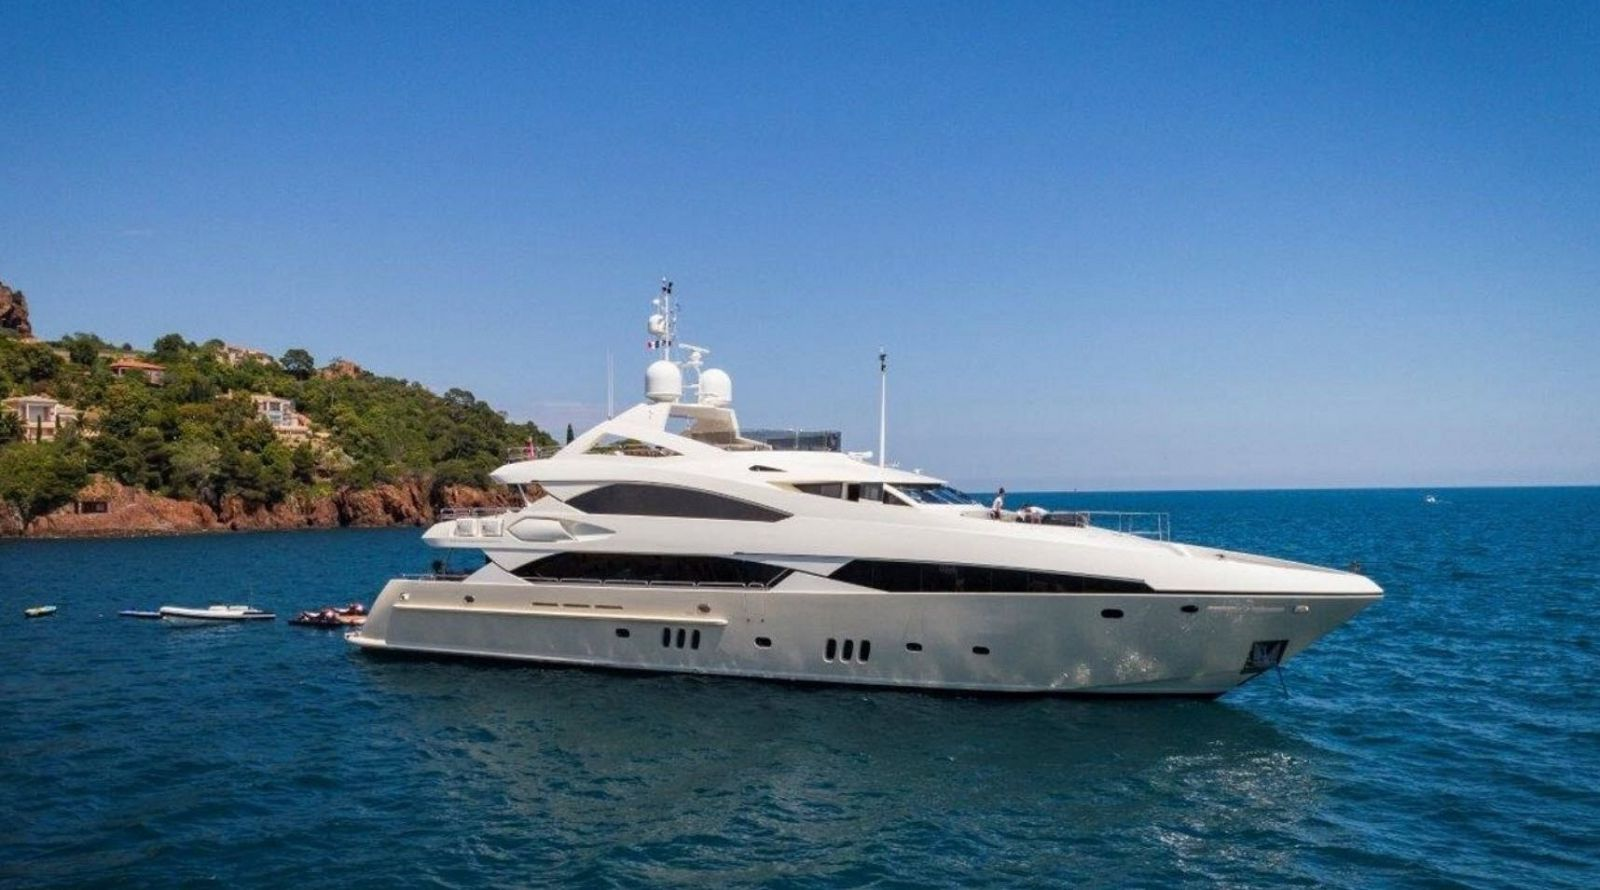 sunseeker 37m yacht for sale